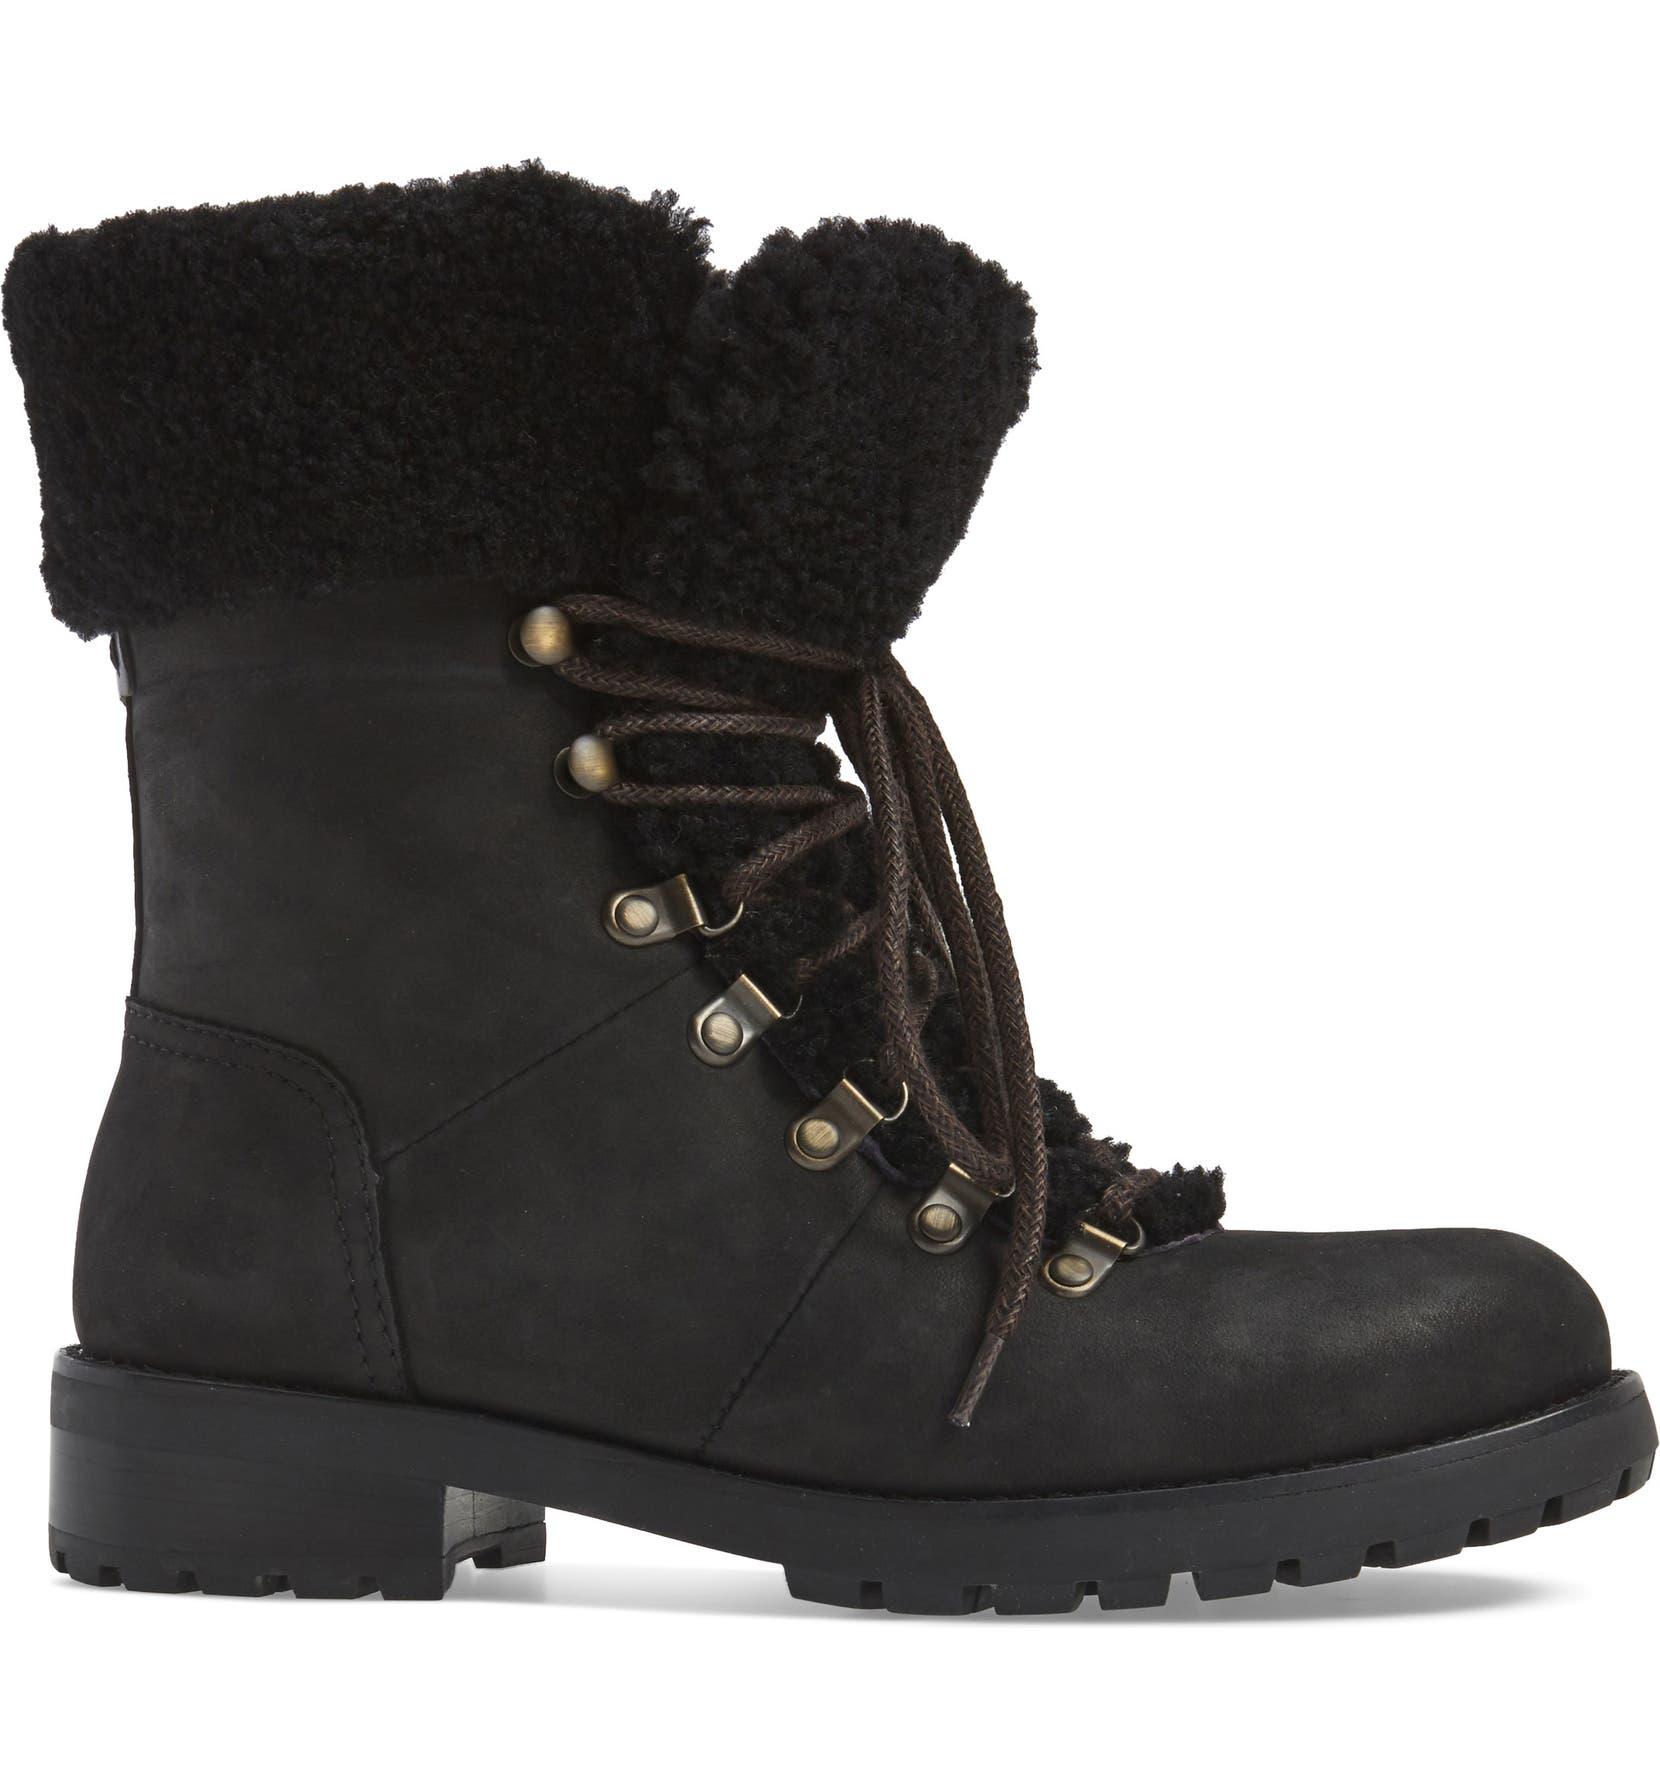 847481ffcff1 UGG® Fraser Genuine Shearling Water Resistant Boot (Women)